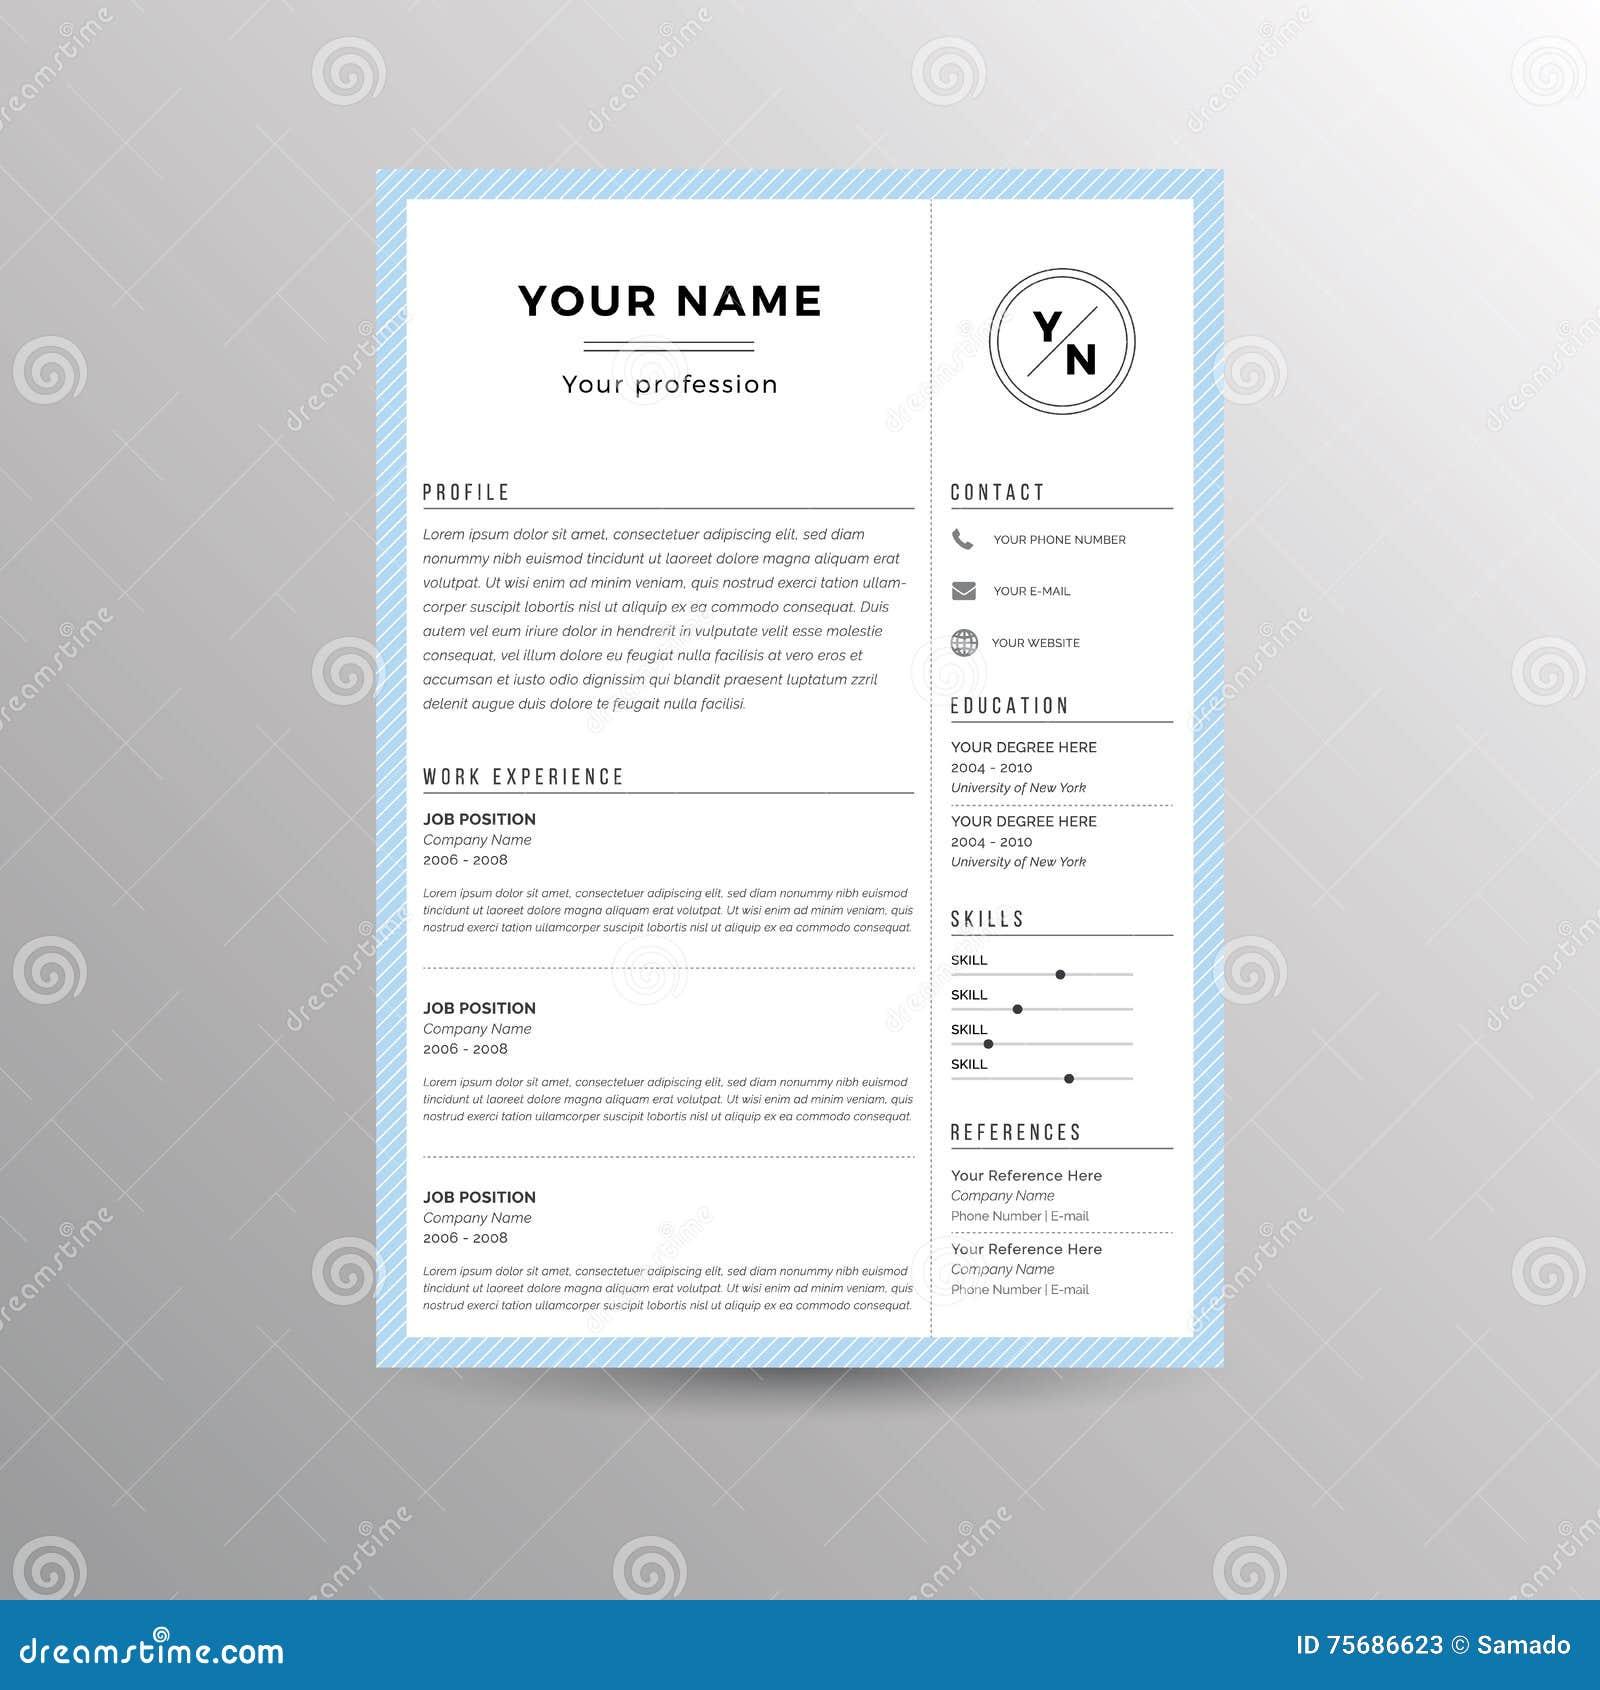 personal keywords apple resume